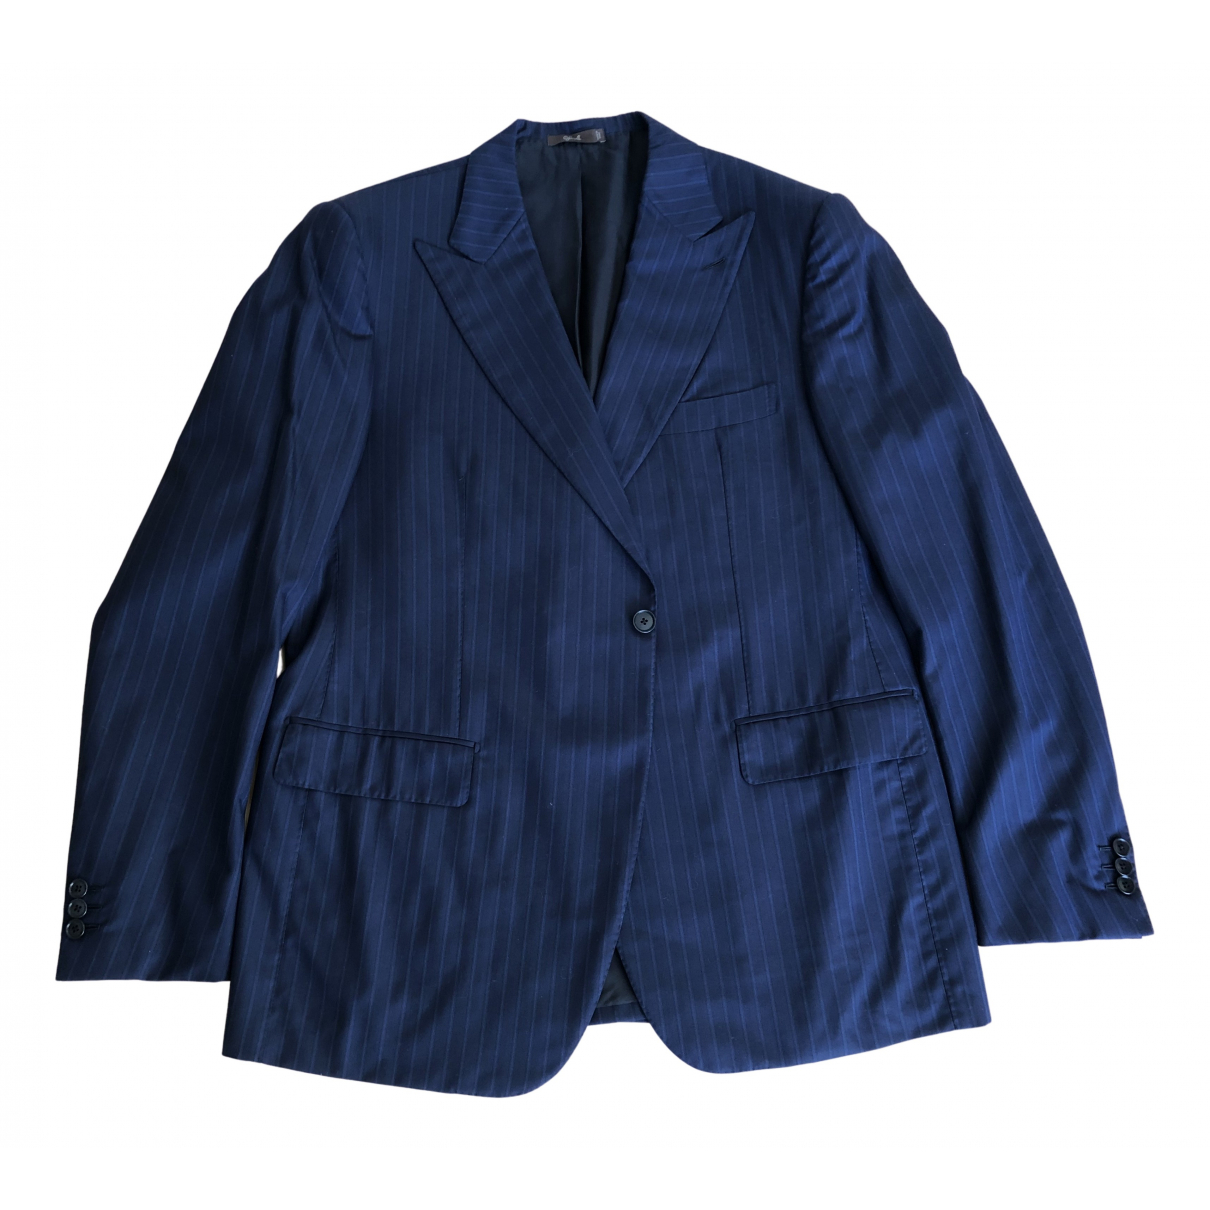 Cifonelli \N Jacke in  Blau Wolle